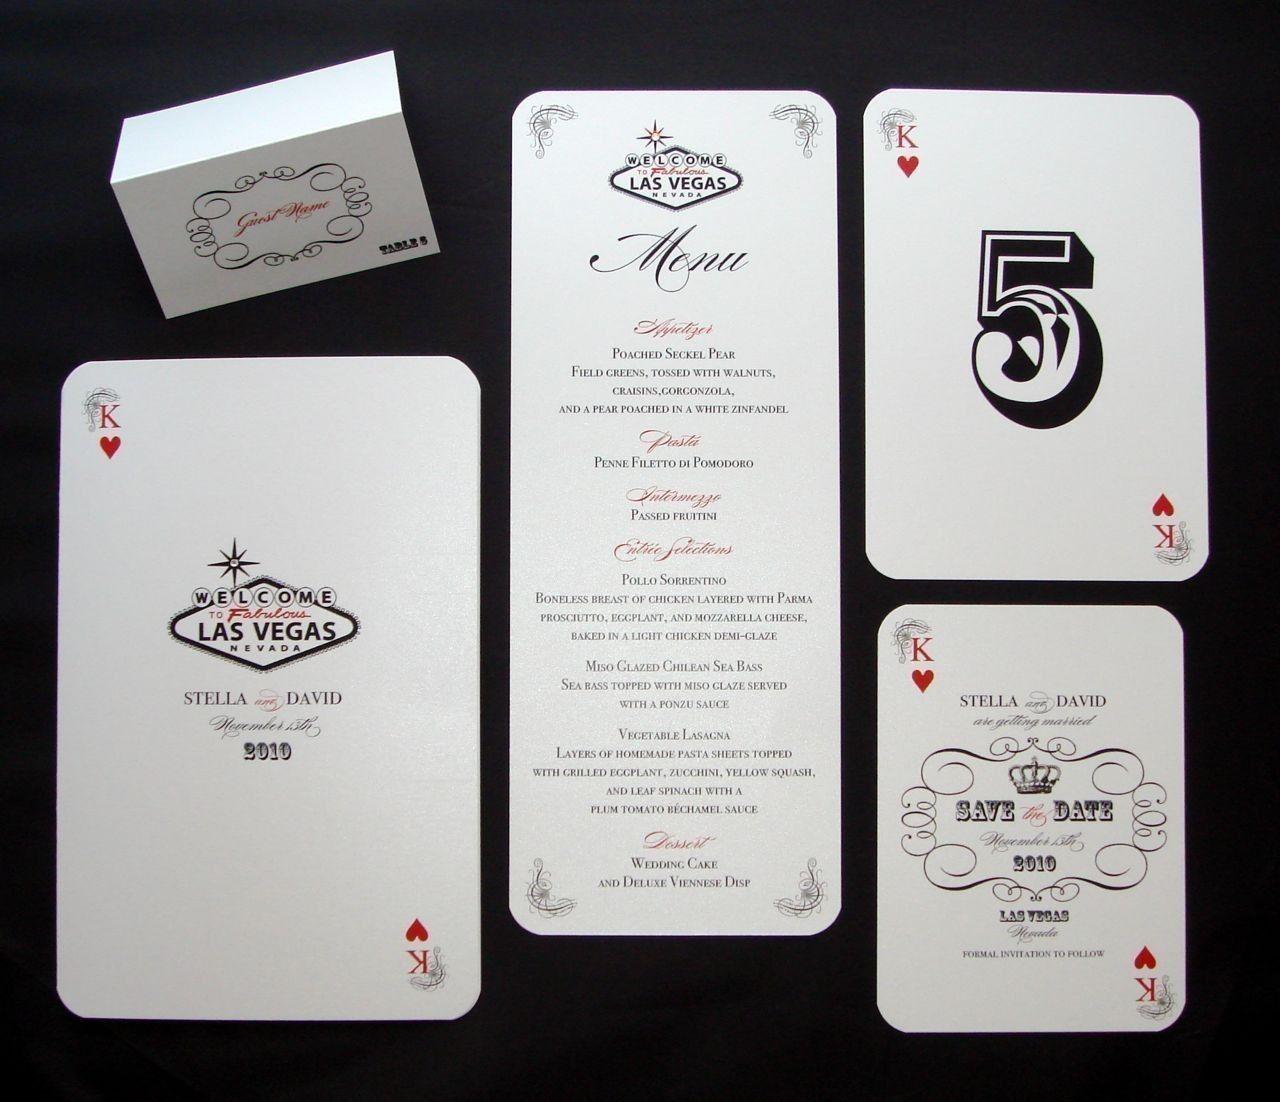 Stella Las Vegas Destination Wedding Save the Date Sample - Playing ...